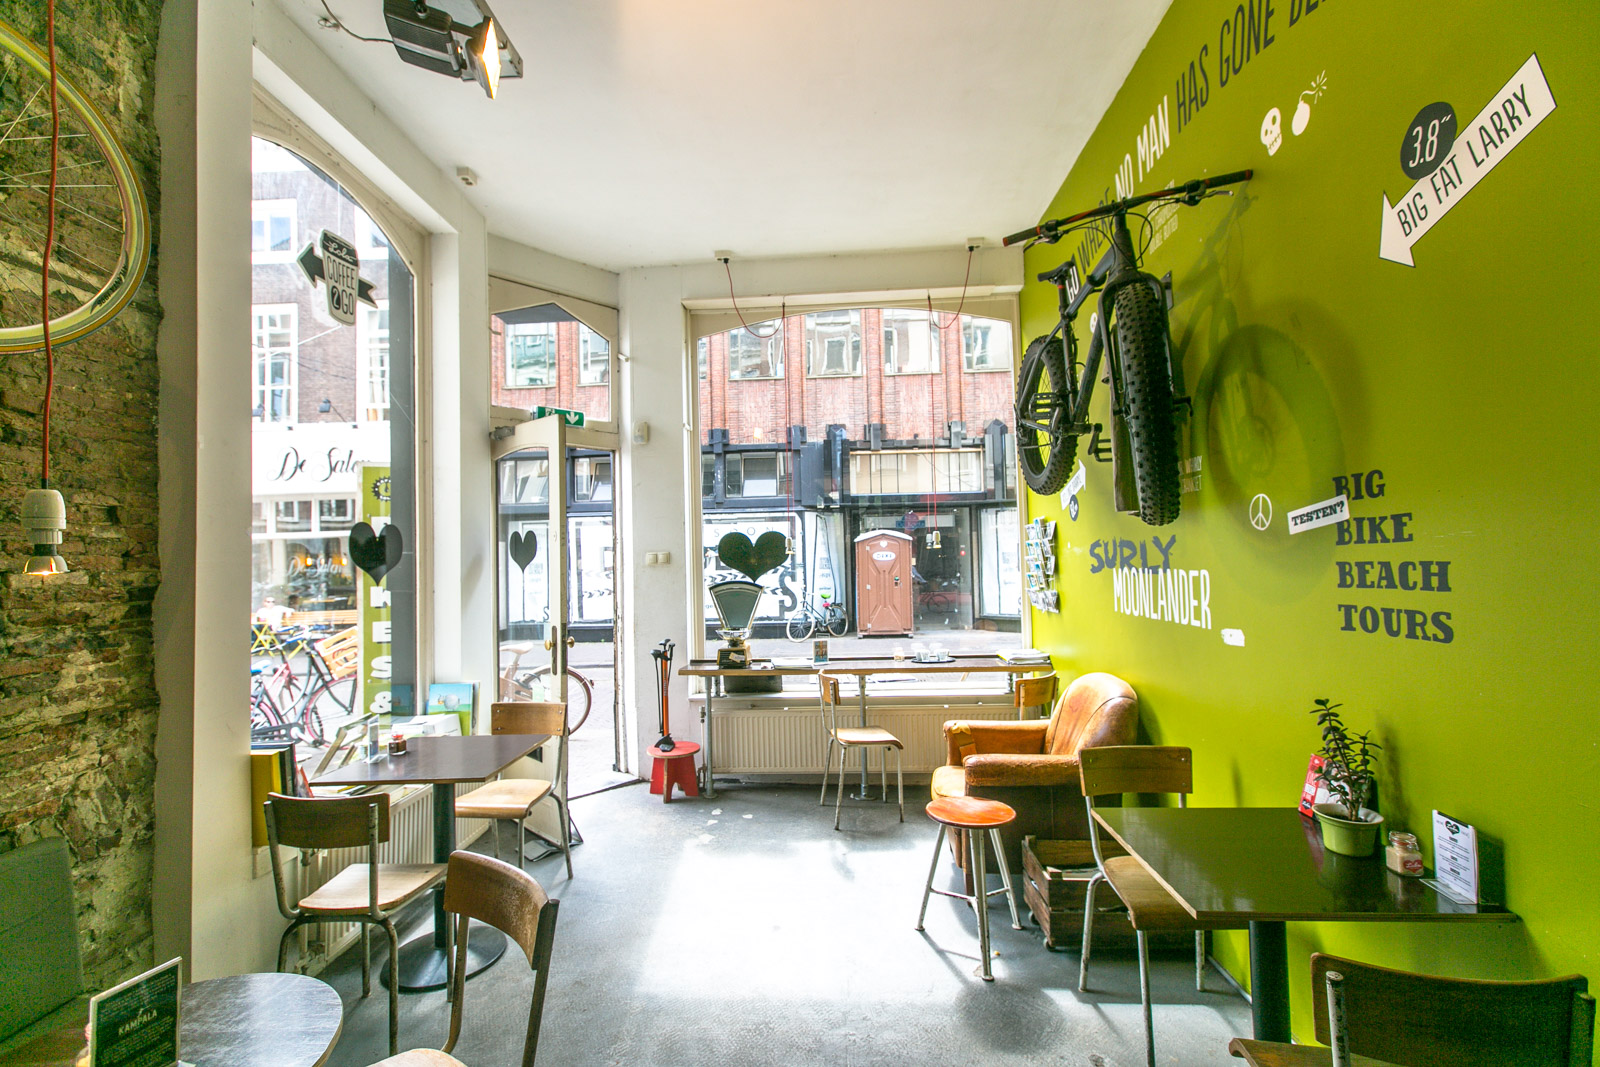 Den Haag Tipps: Lola Bikes & Coffee